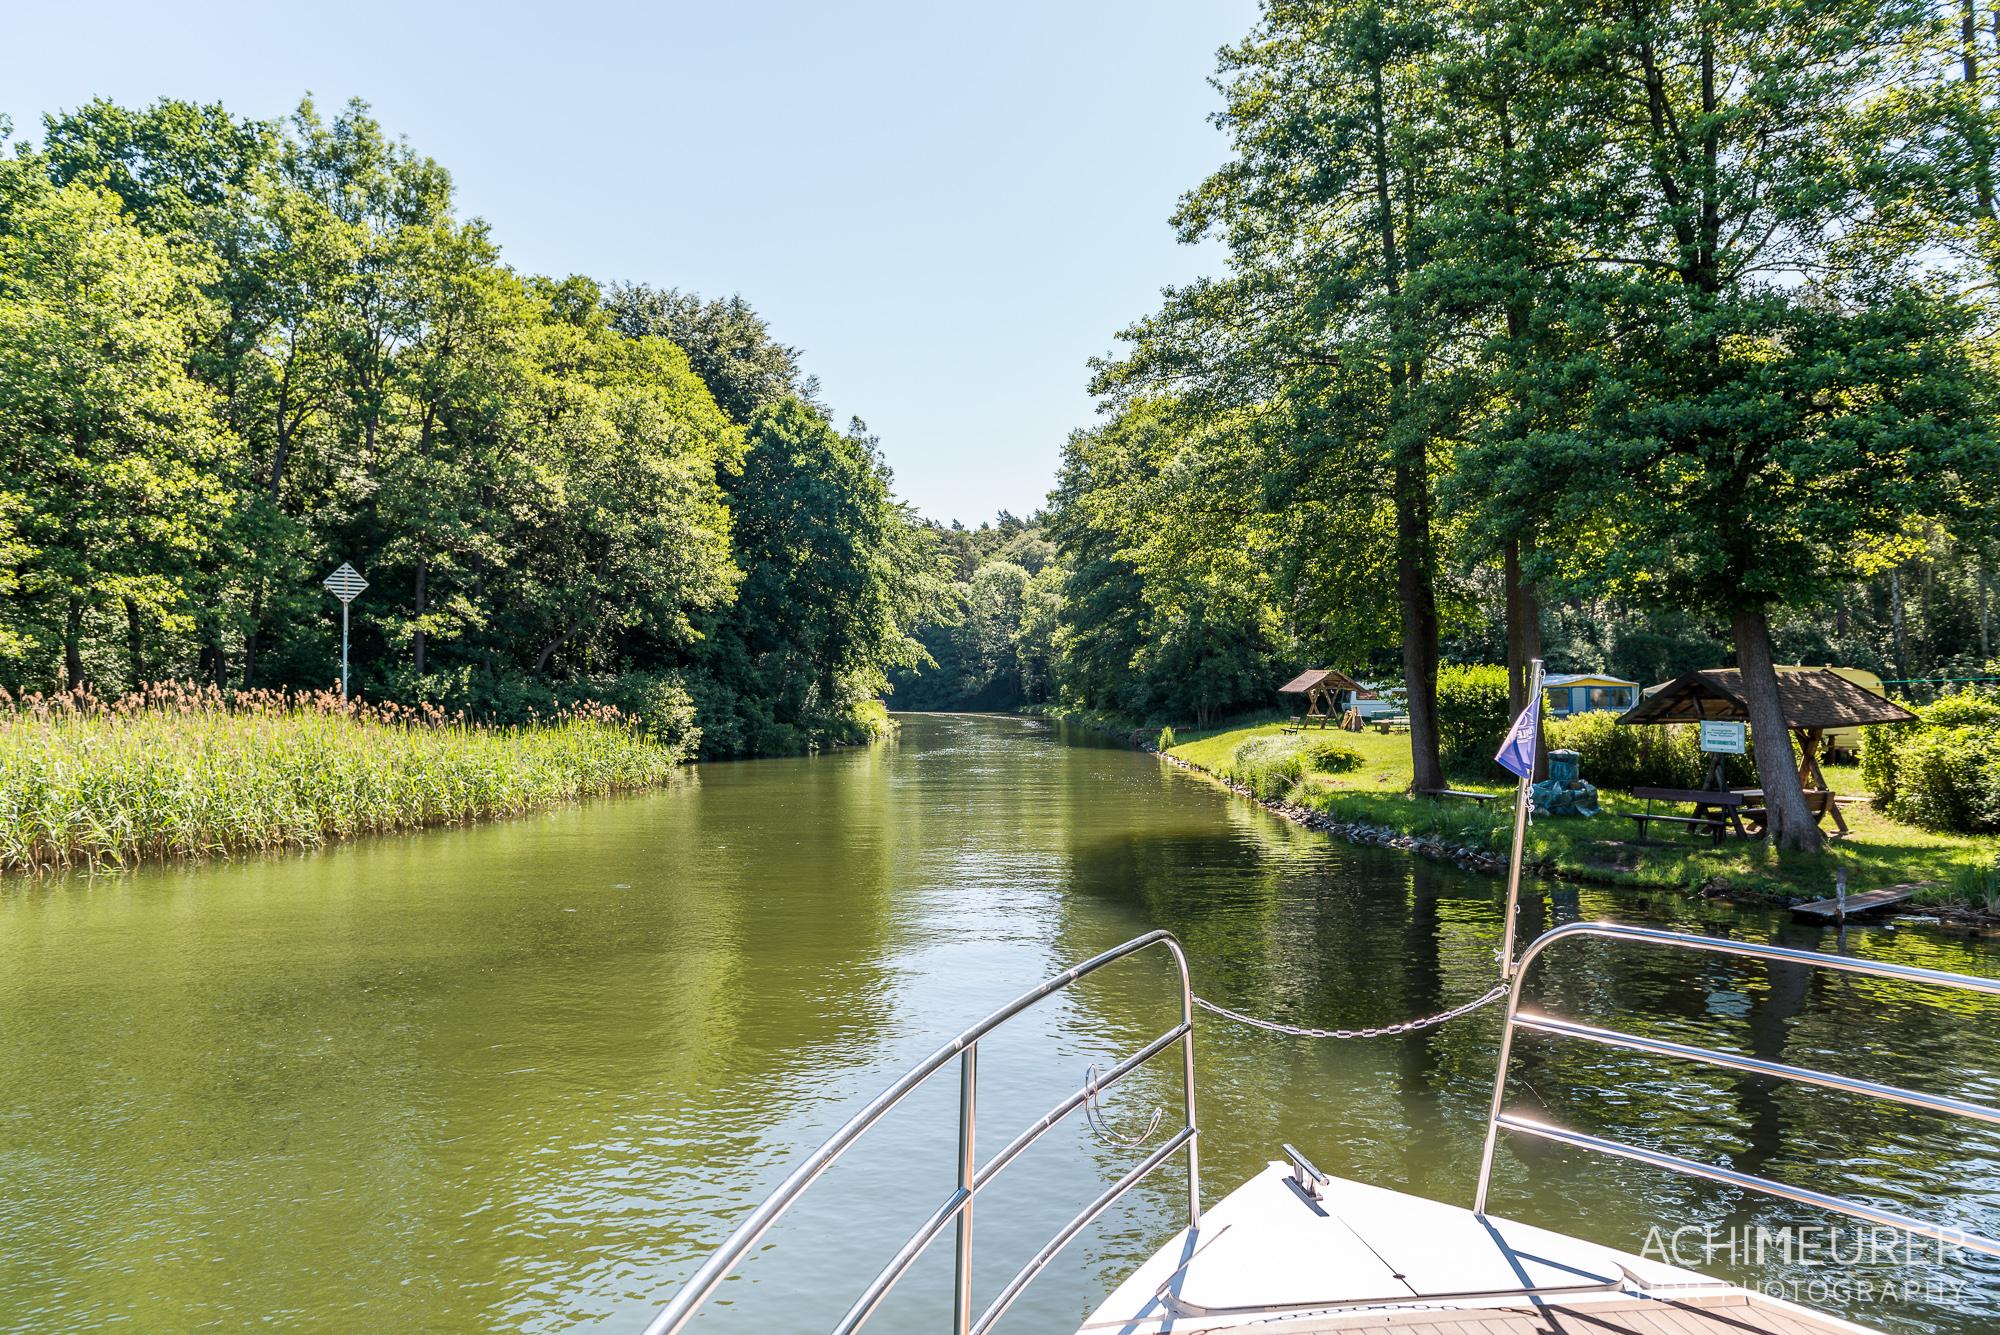 Hausboot-Kuhnle-Mueritz-Mecklenburg-Vorpommern-See_3133